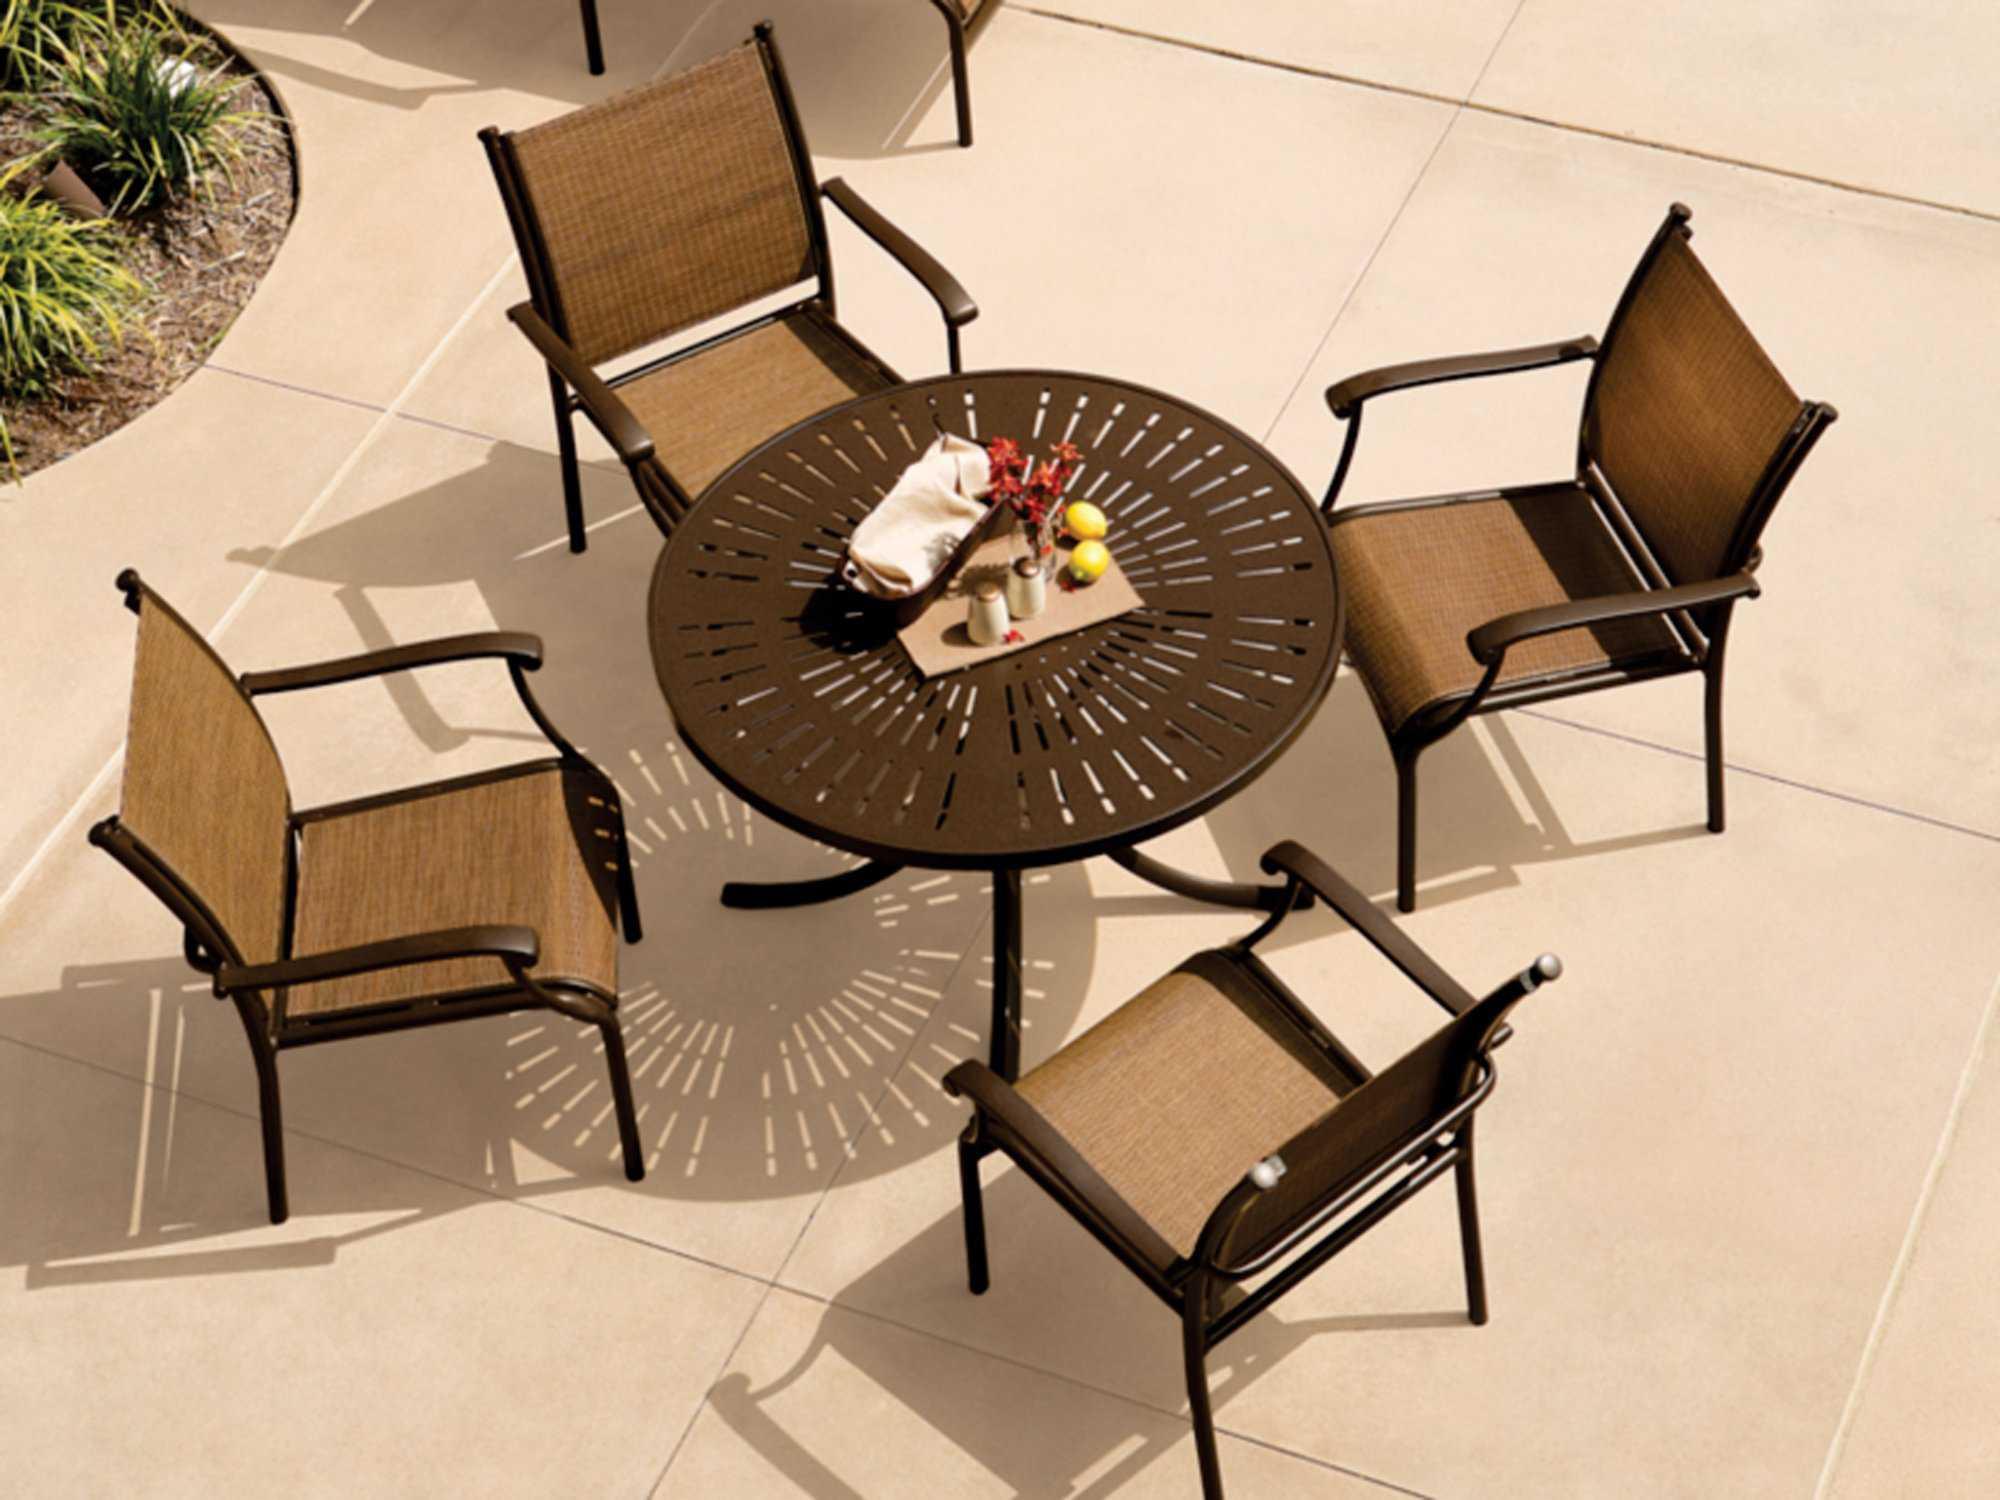 Tropitone la stratta aluminum 42 round dining table with - Aluminium picnic table with umbrella ...